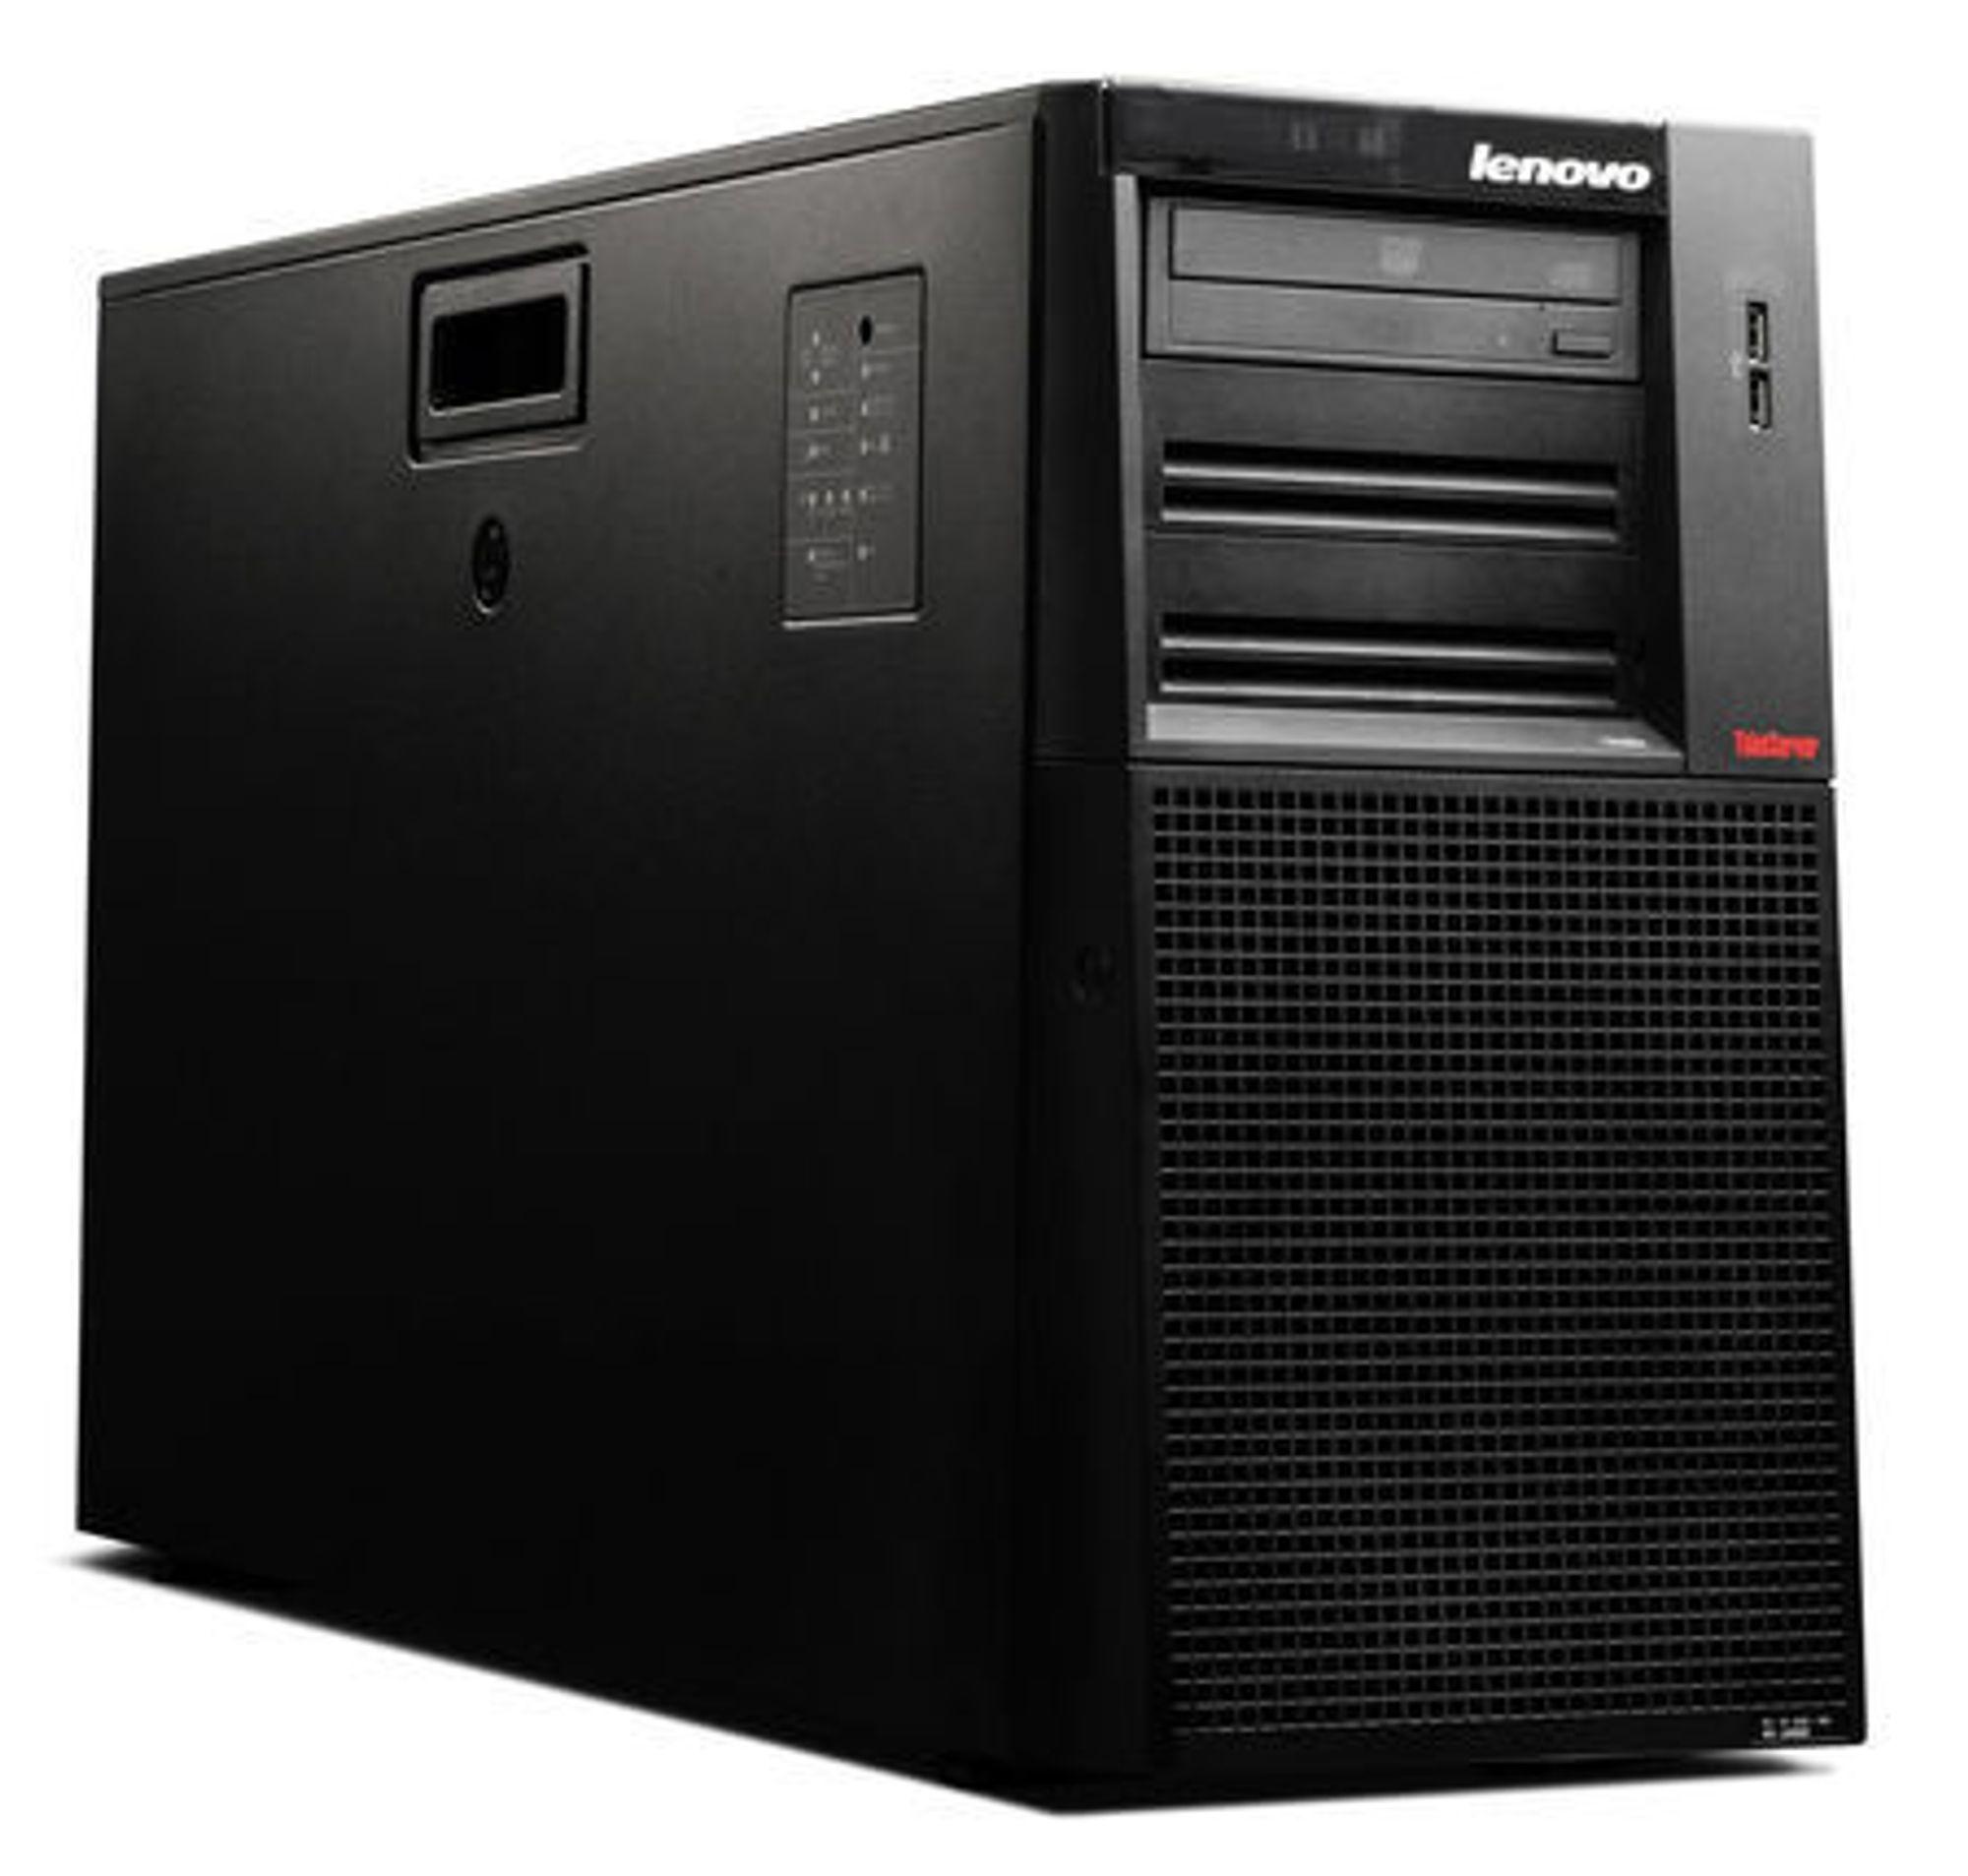 Lenovo ThinkServer TD100